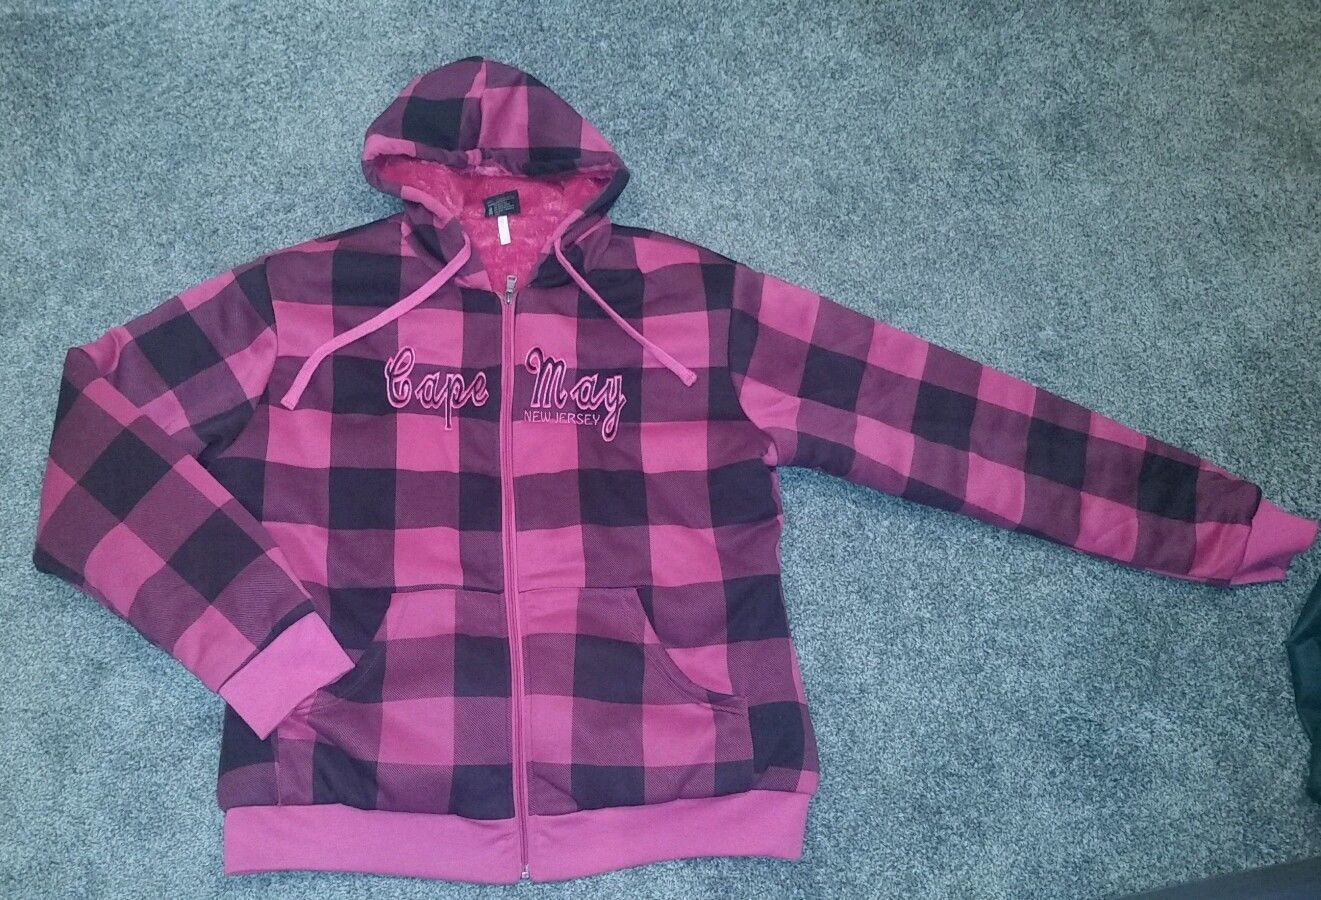 Cape May NJ Hooded Full Zip Original Deluxe Pink & Black Plaid Jacket, Kids 2XL